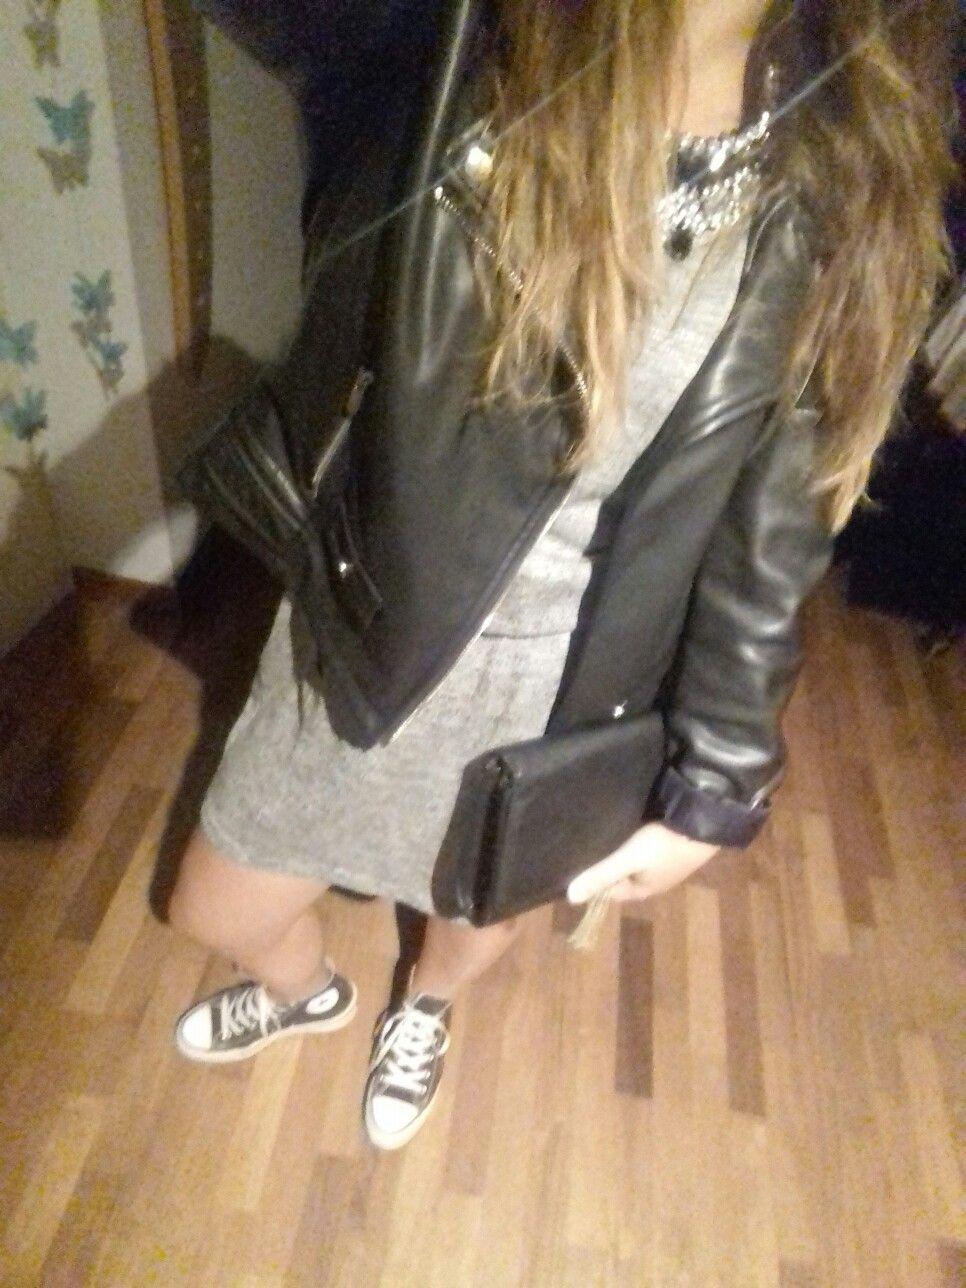 Black jacket, black converse all star, black pocket te and finally grey dress.. stay rock✌